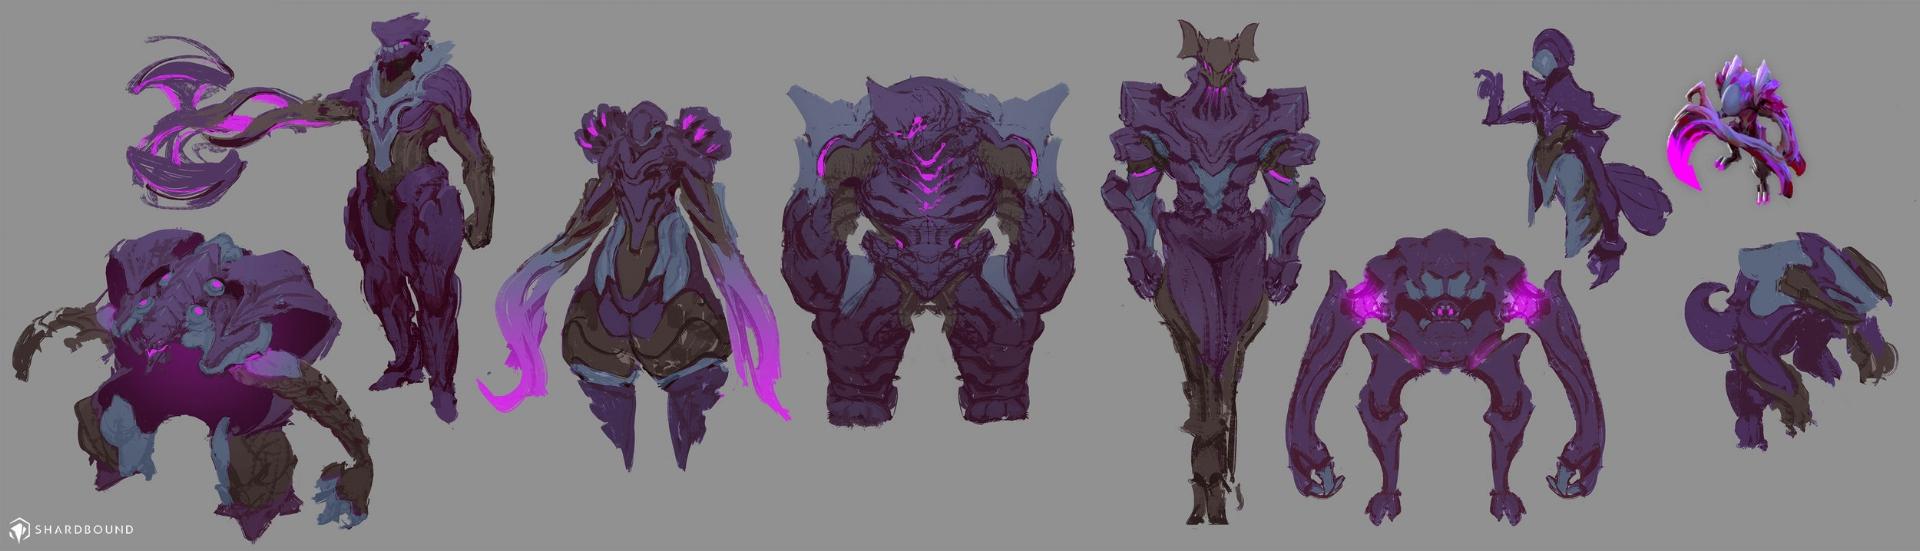 PurpleFaction_VizDev_AeonCorporation_Monsters1.jpg